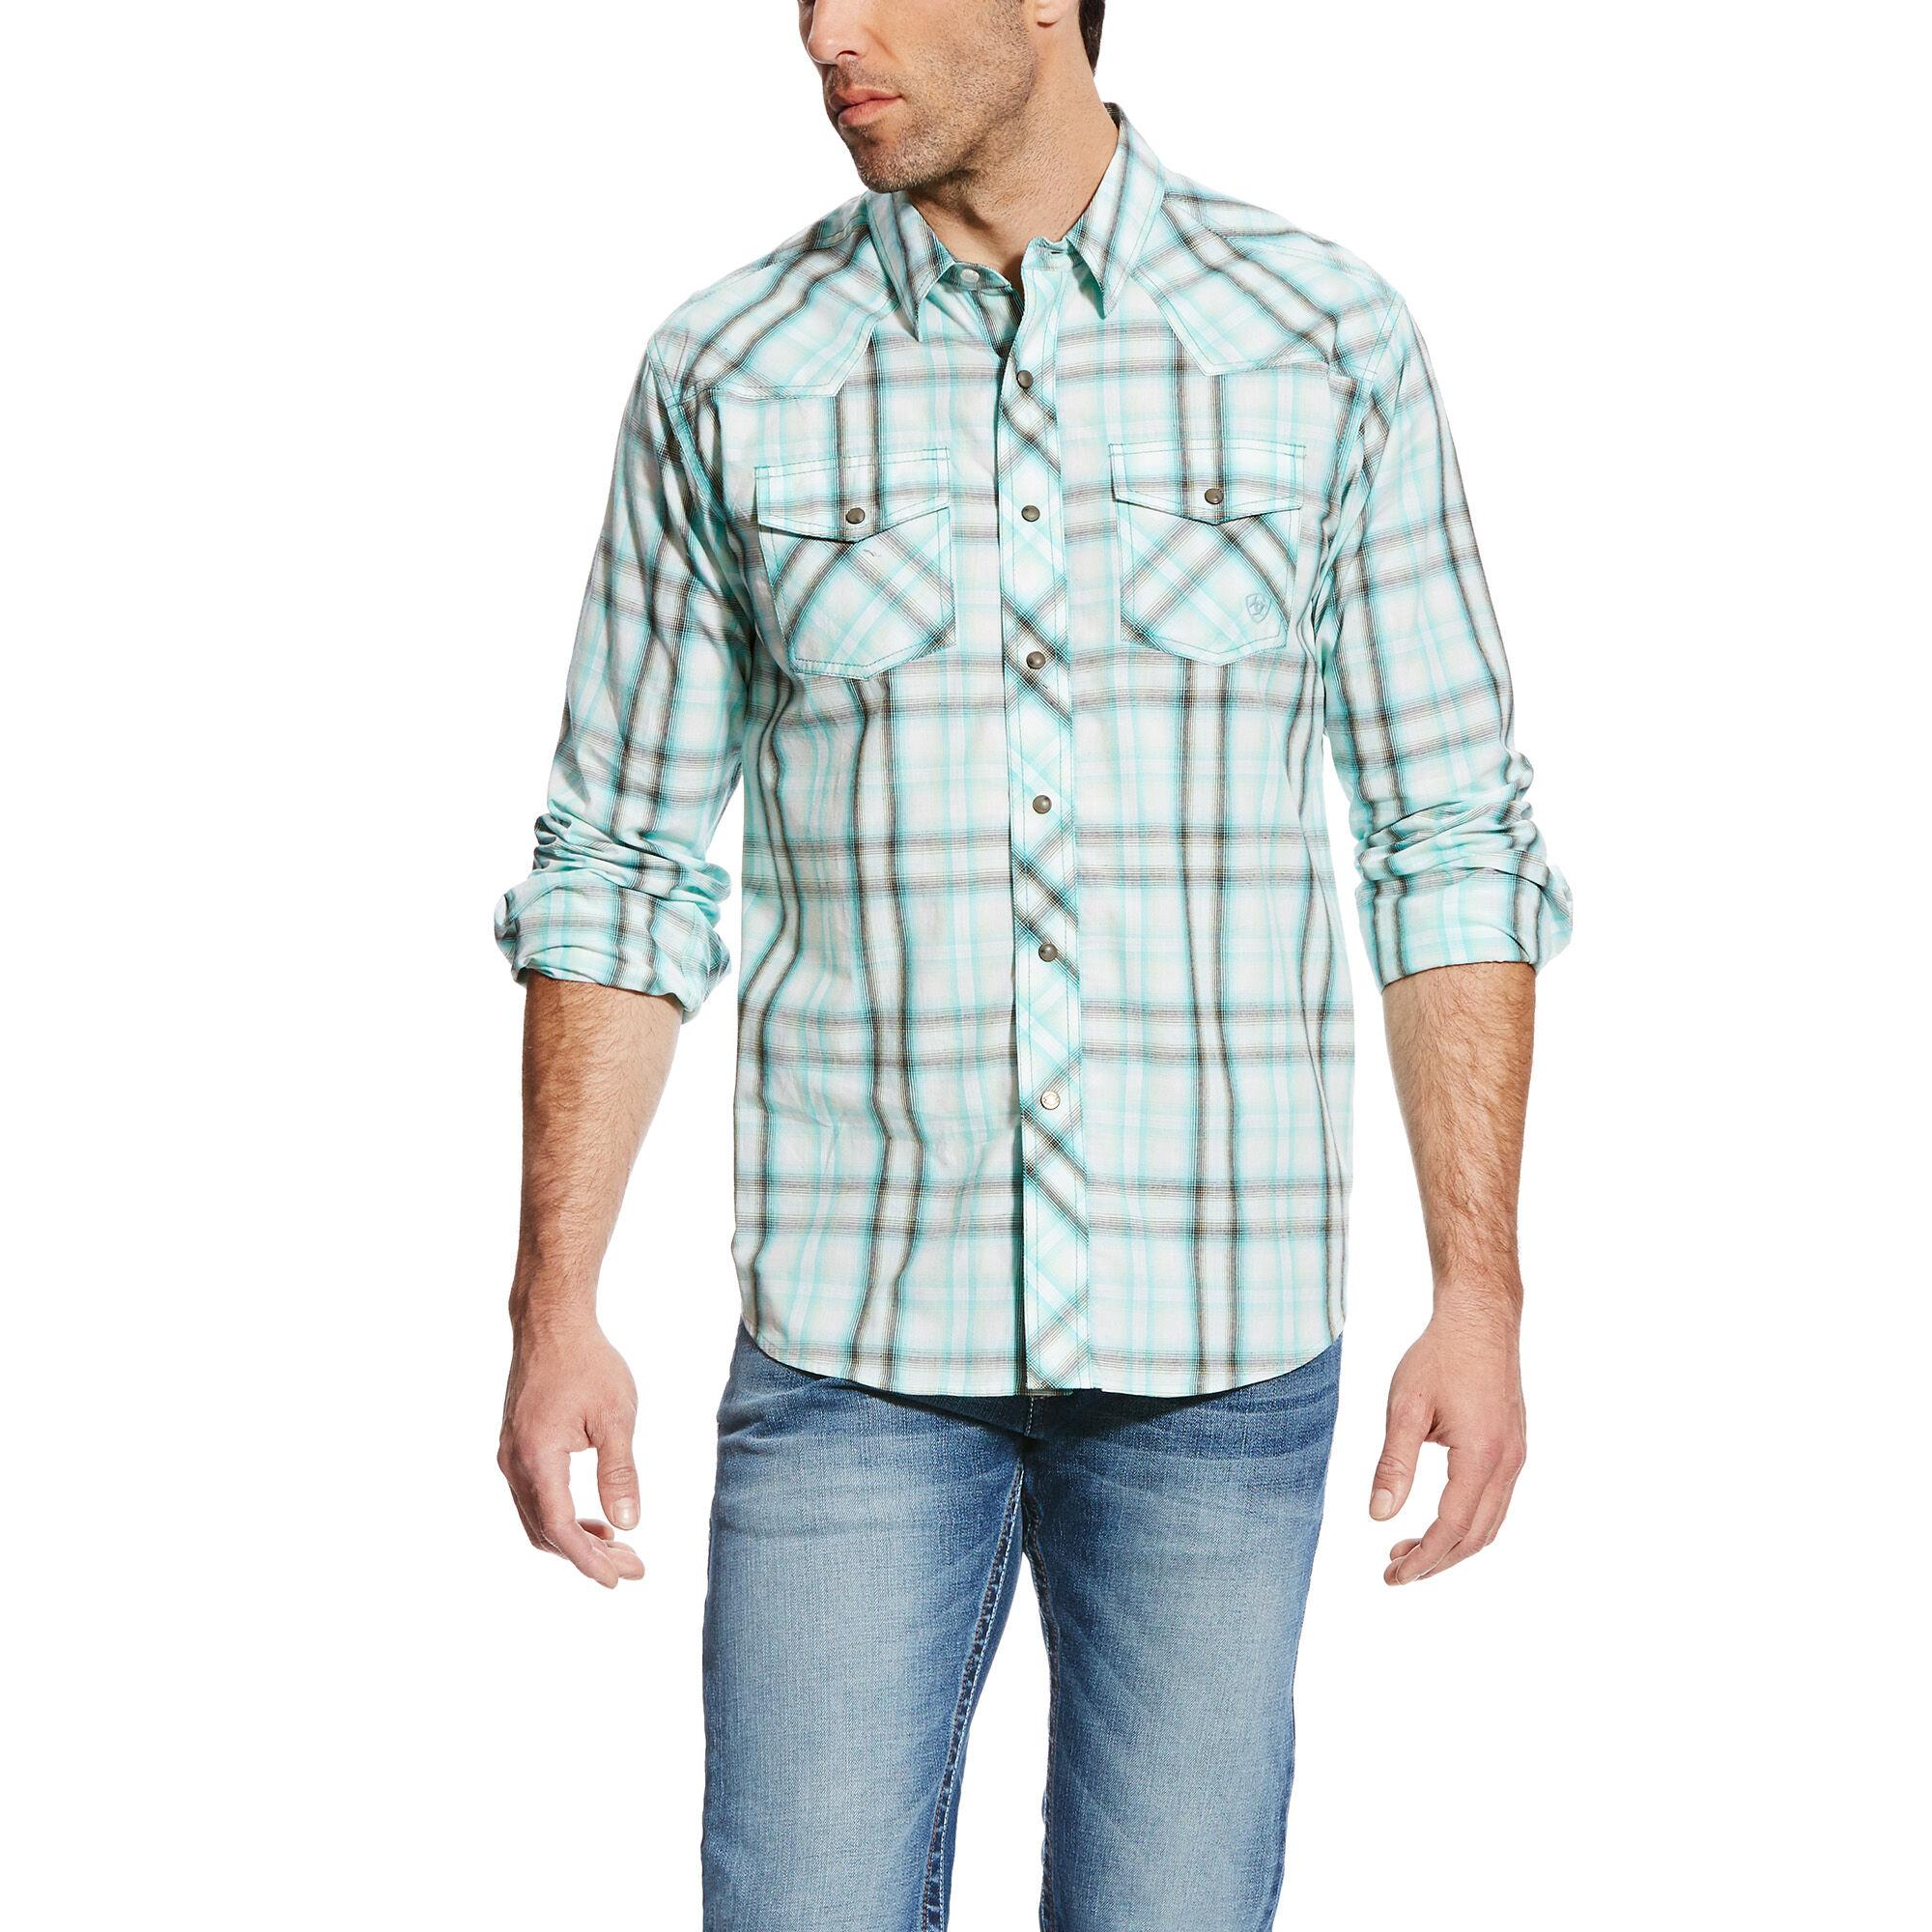 Irvan Snap Retro Shirt